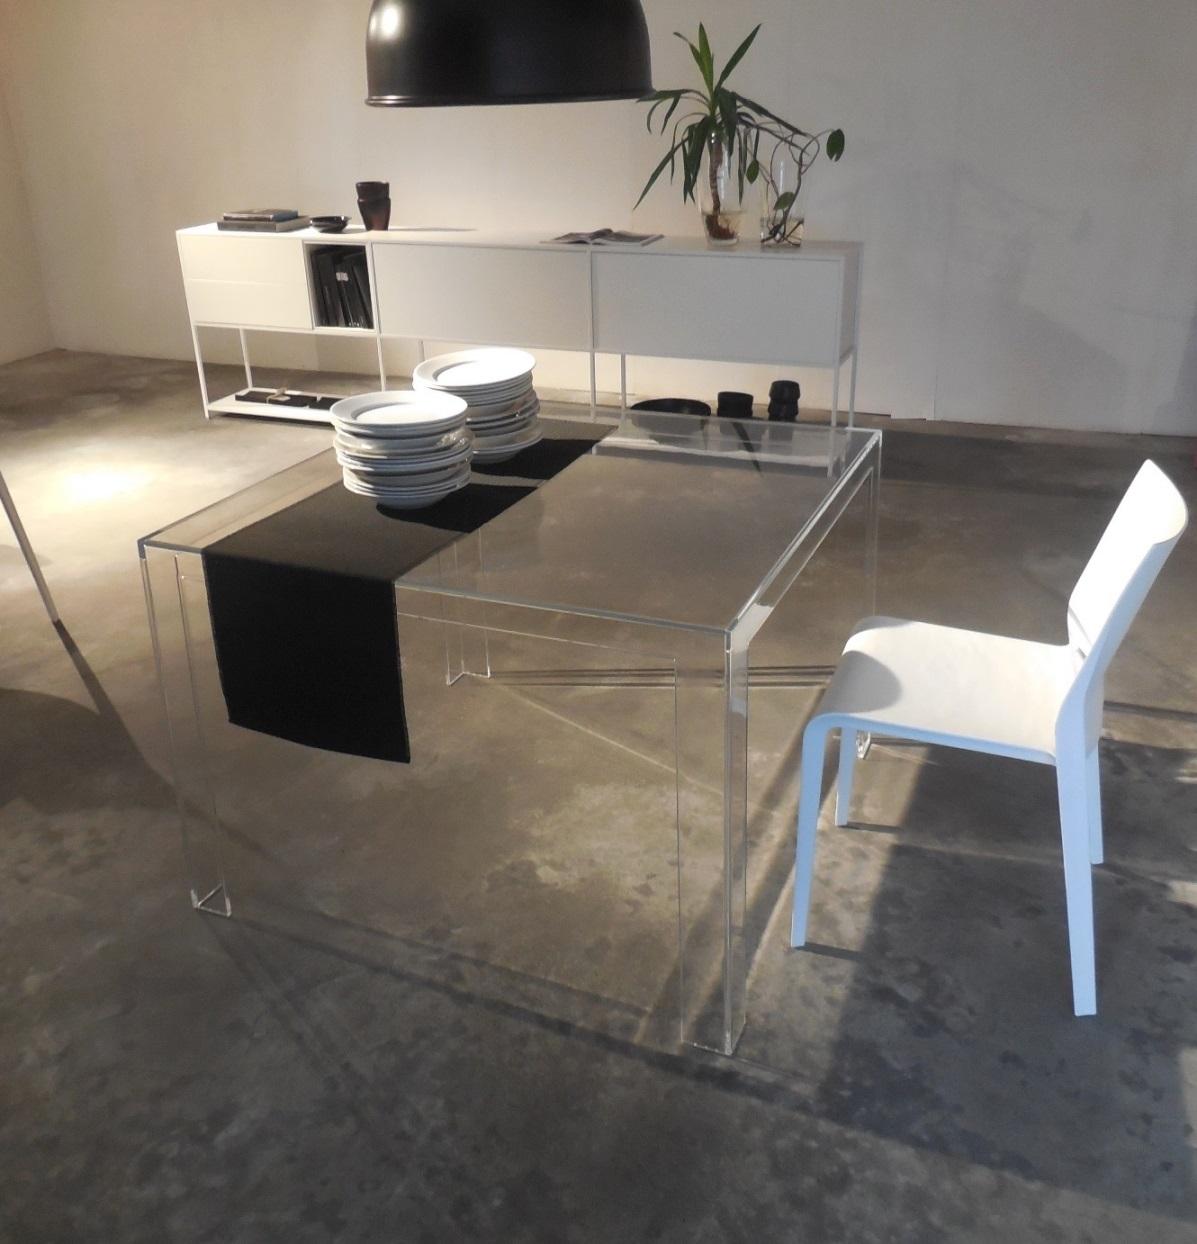 Kartell tavolo tavolo quadrato invisible kartell tavoli - Tavolo four kartell prezzo ...